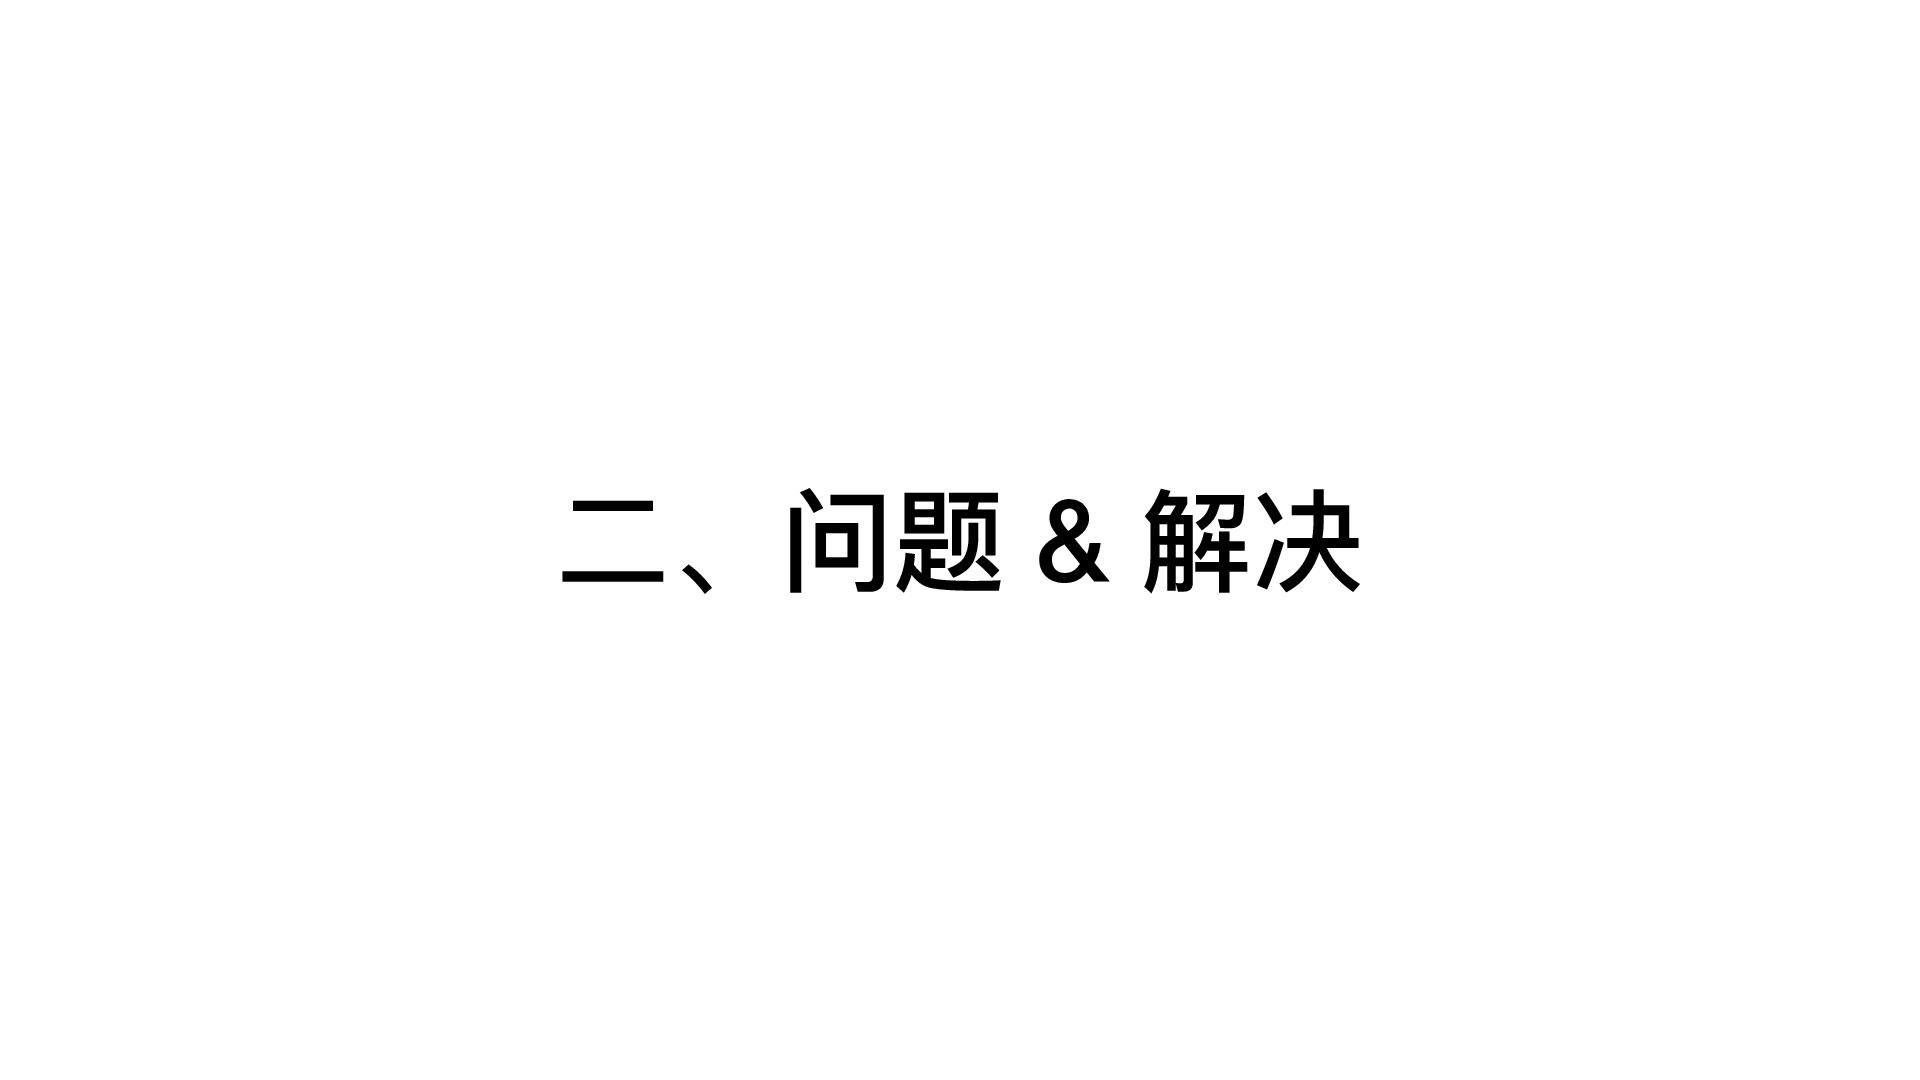 https://opentalk-blog.b0.upaiyun.com/prod/2019-03-25/48b399e95117c85b937b3b80d3d61543